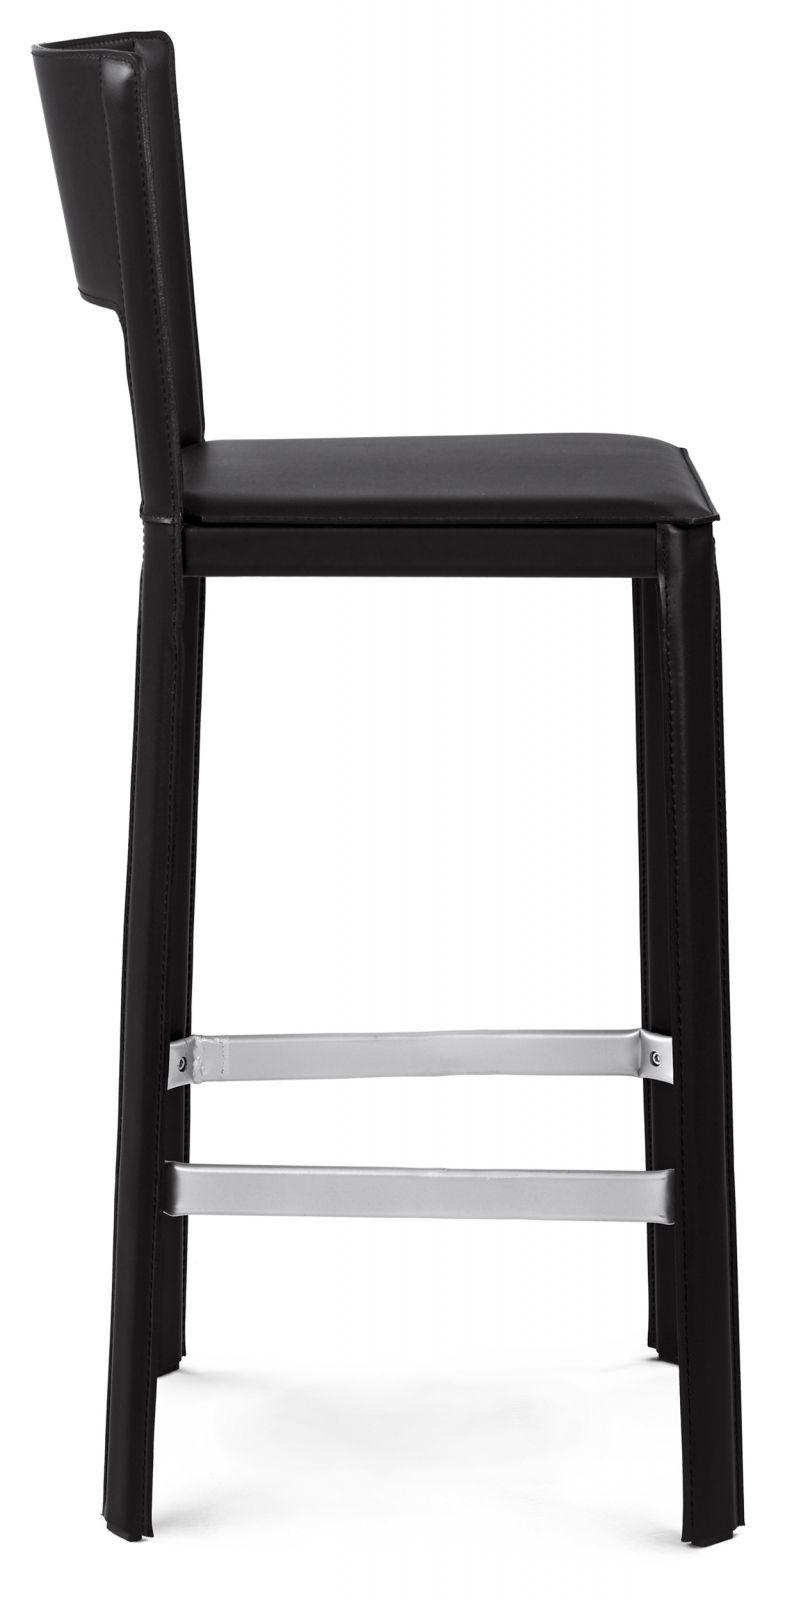 modern-bar-stools-Italian-furniture-large (33).jpg